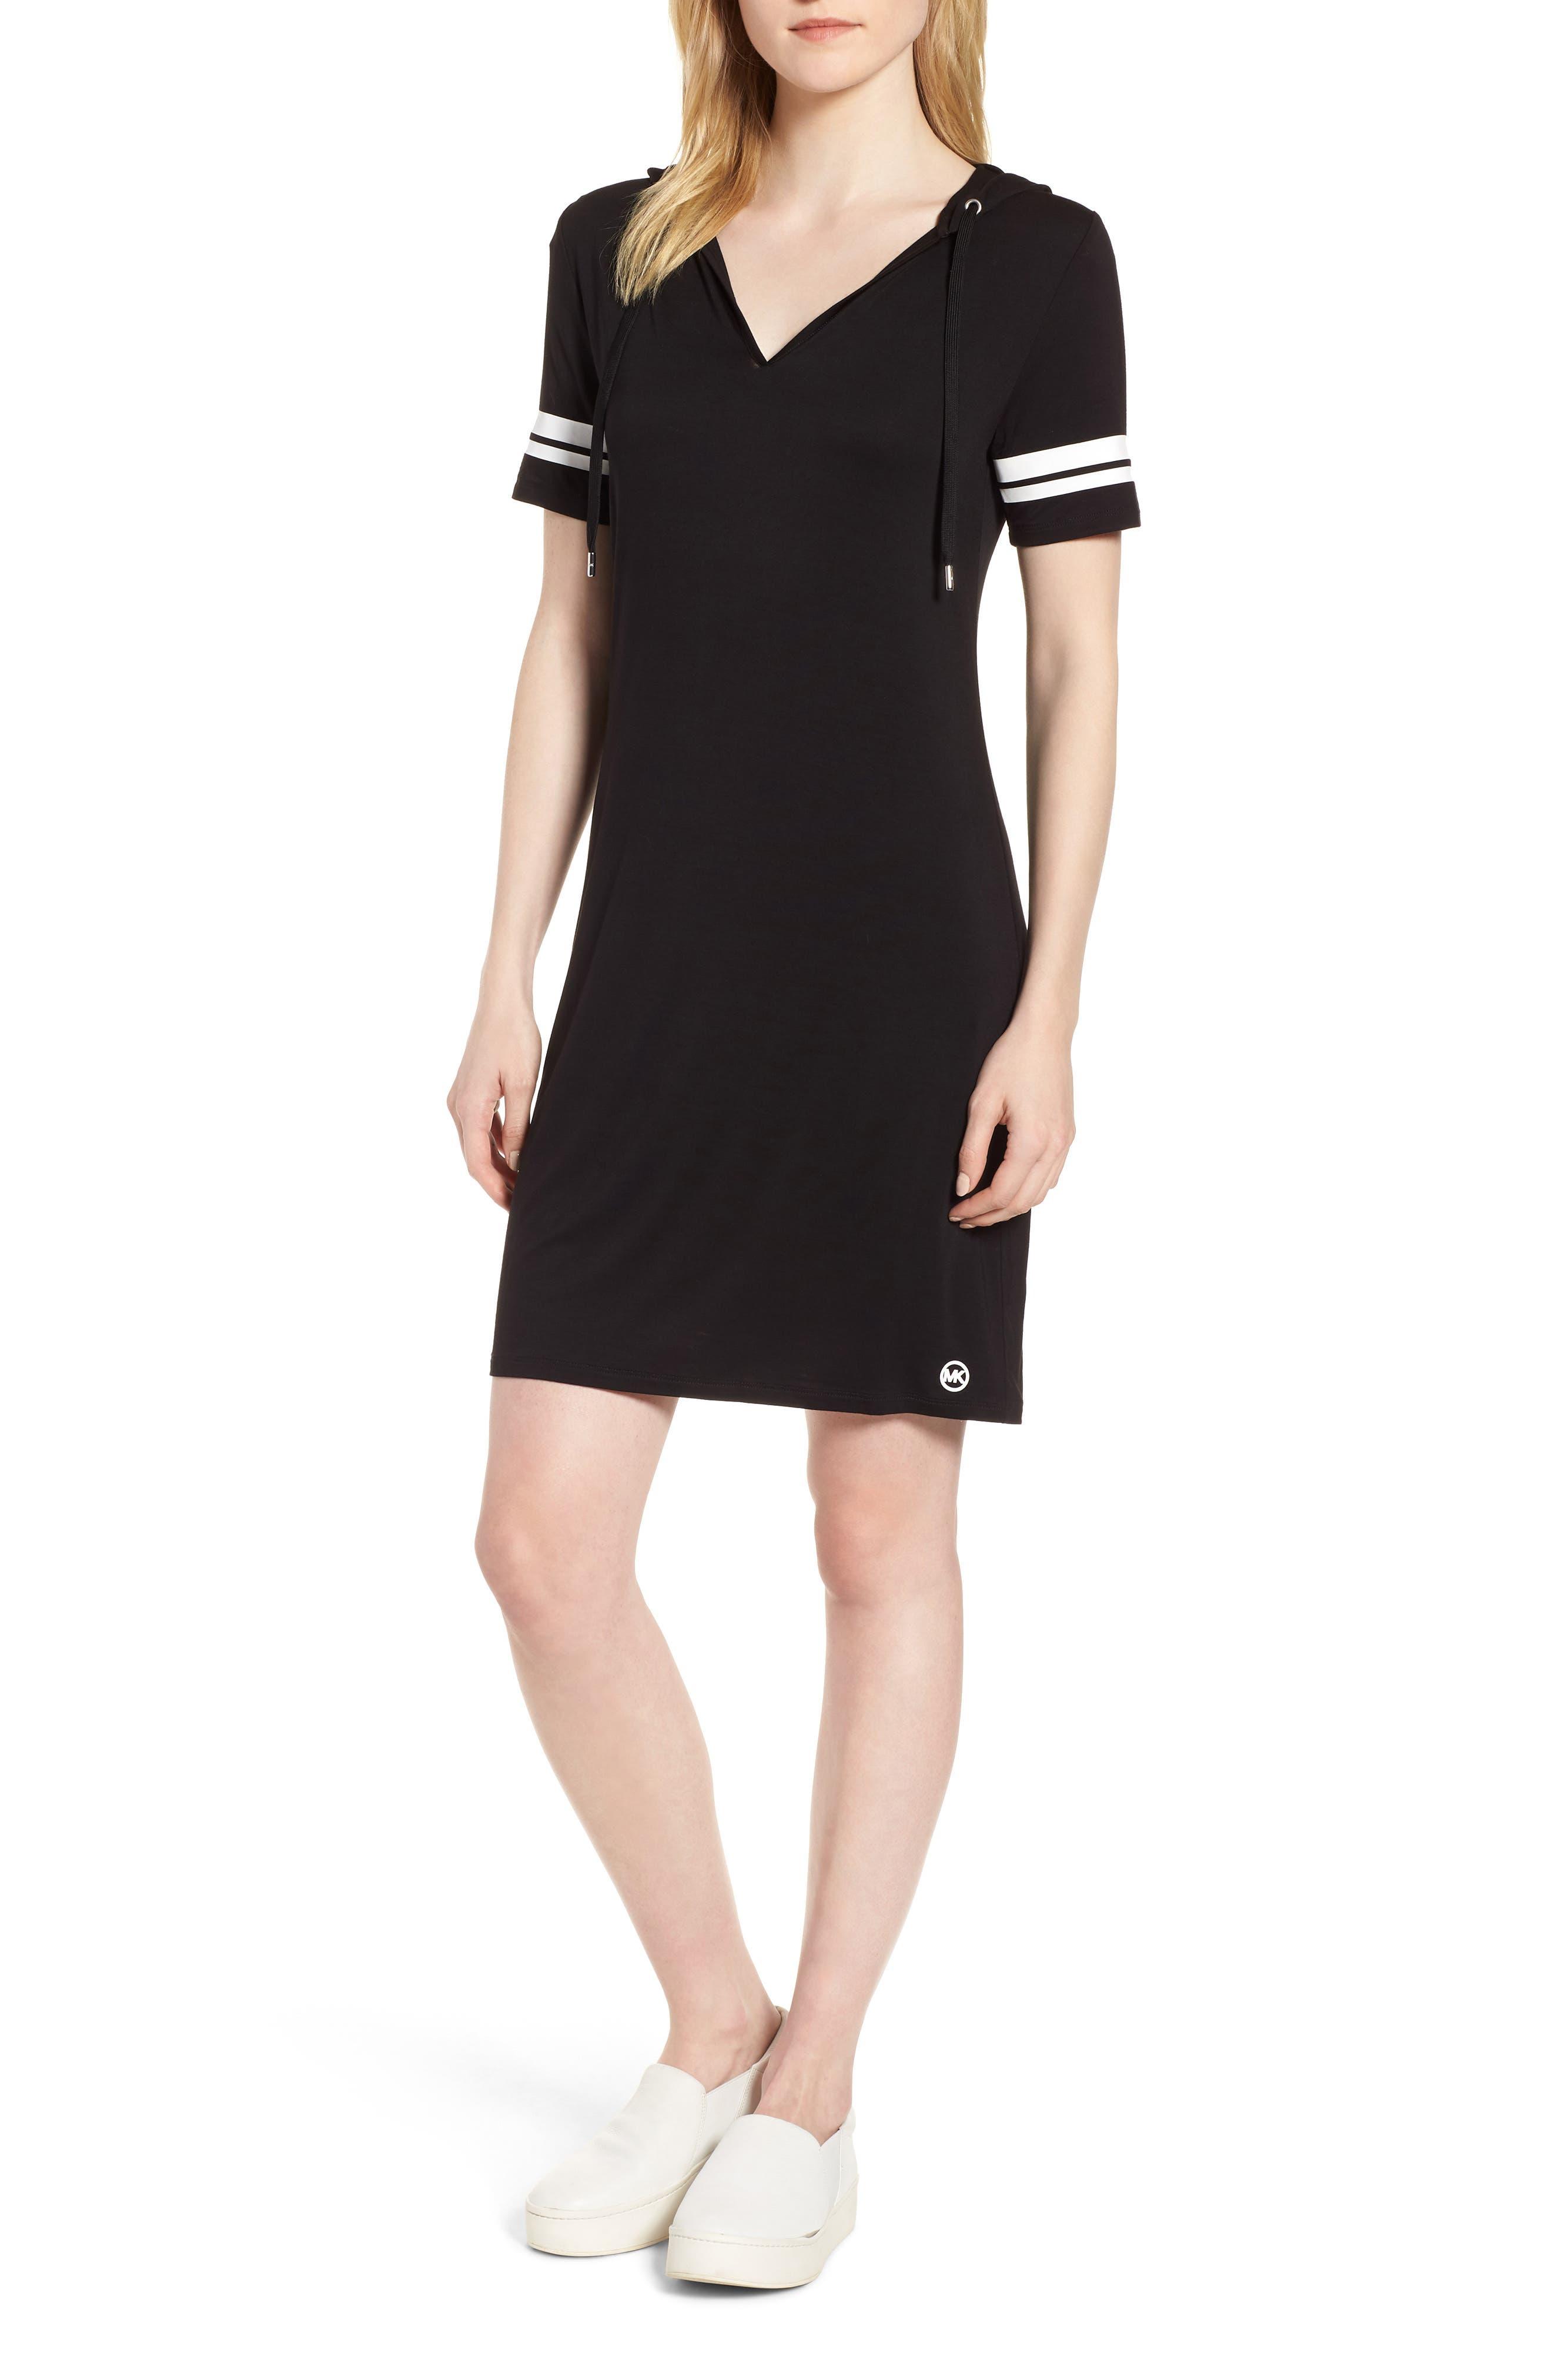 MICHAEL Michal Kors Stripe Sleeve Hoodie Dress,                             Main thumbnail 1, color,                             Black